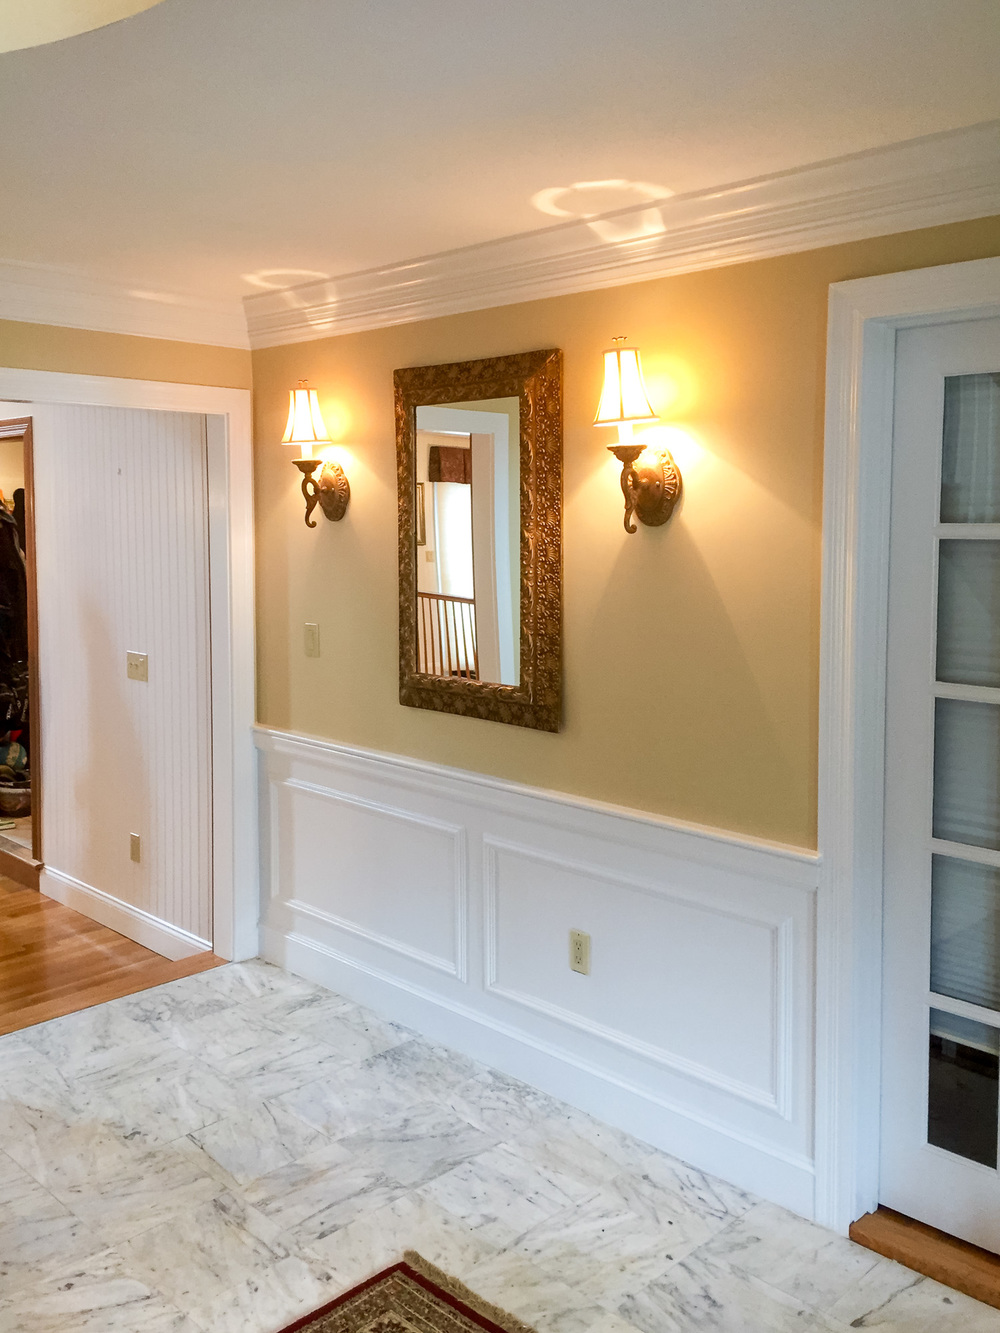 big-dog-painting-interior-paneling.jpg